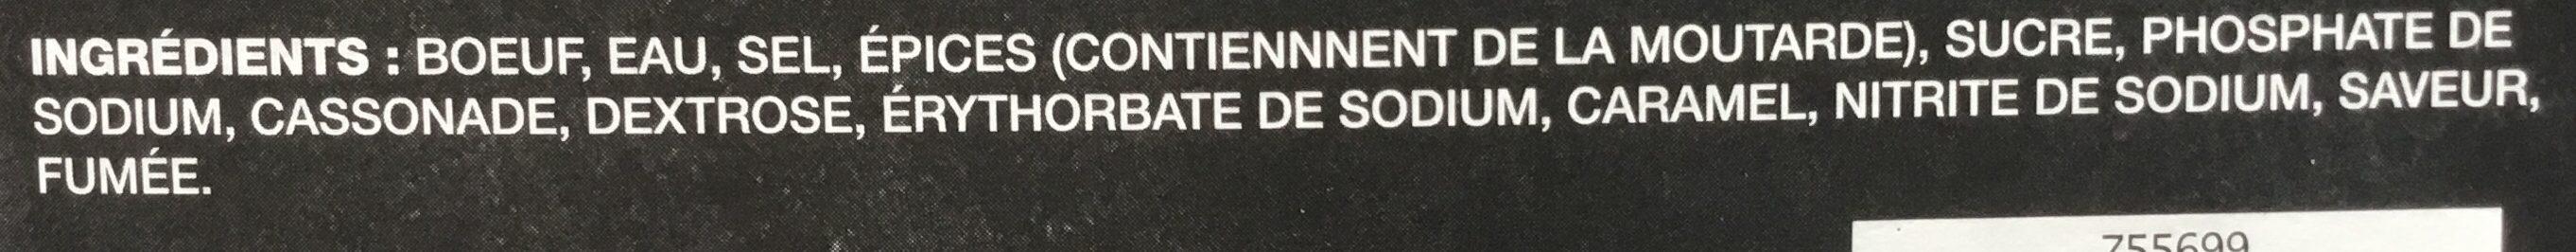 Montréal Smoked Meat - Ingrédients - fr